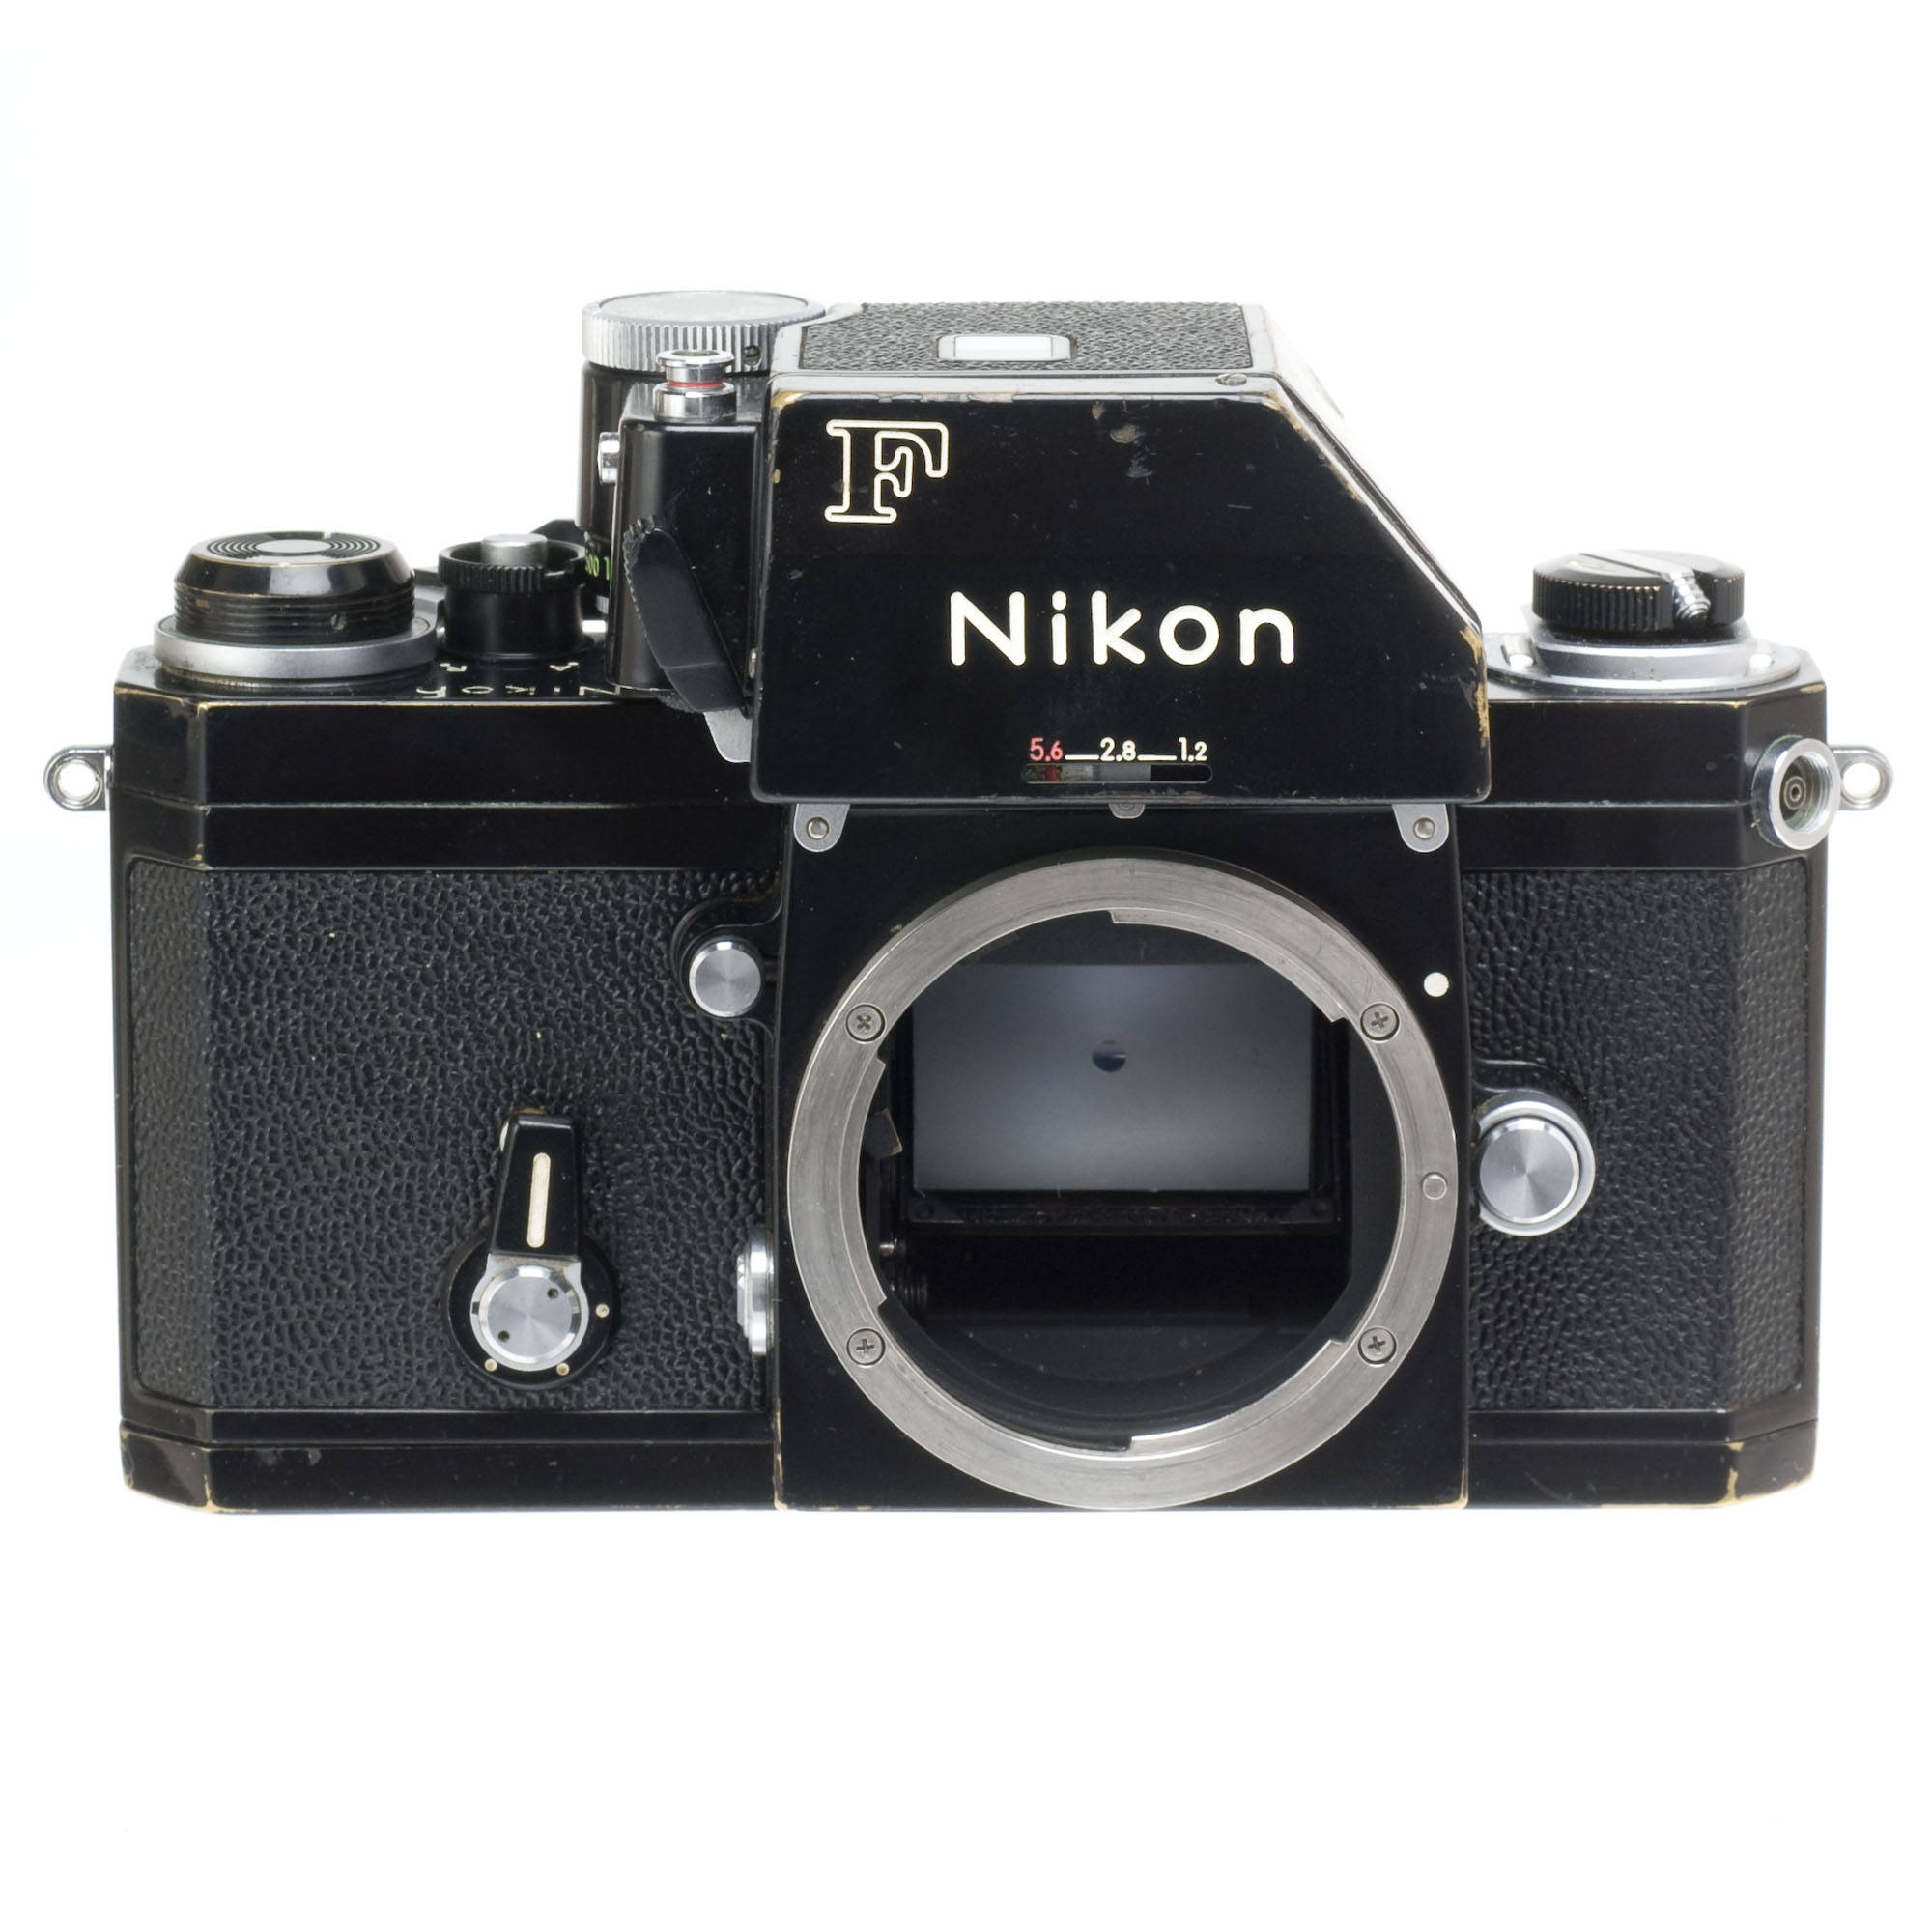 used nikon f photomic ftn apollo 35mm slr camera body black rh bhphotovideo com nikon f photomic instruction manual nikon f photomic manuale